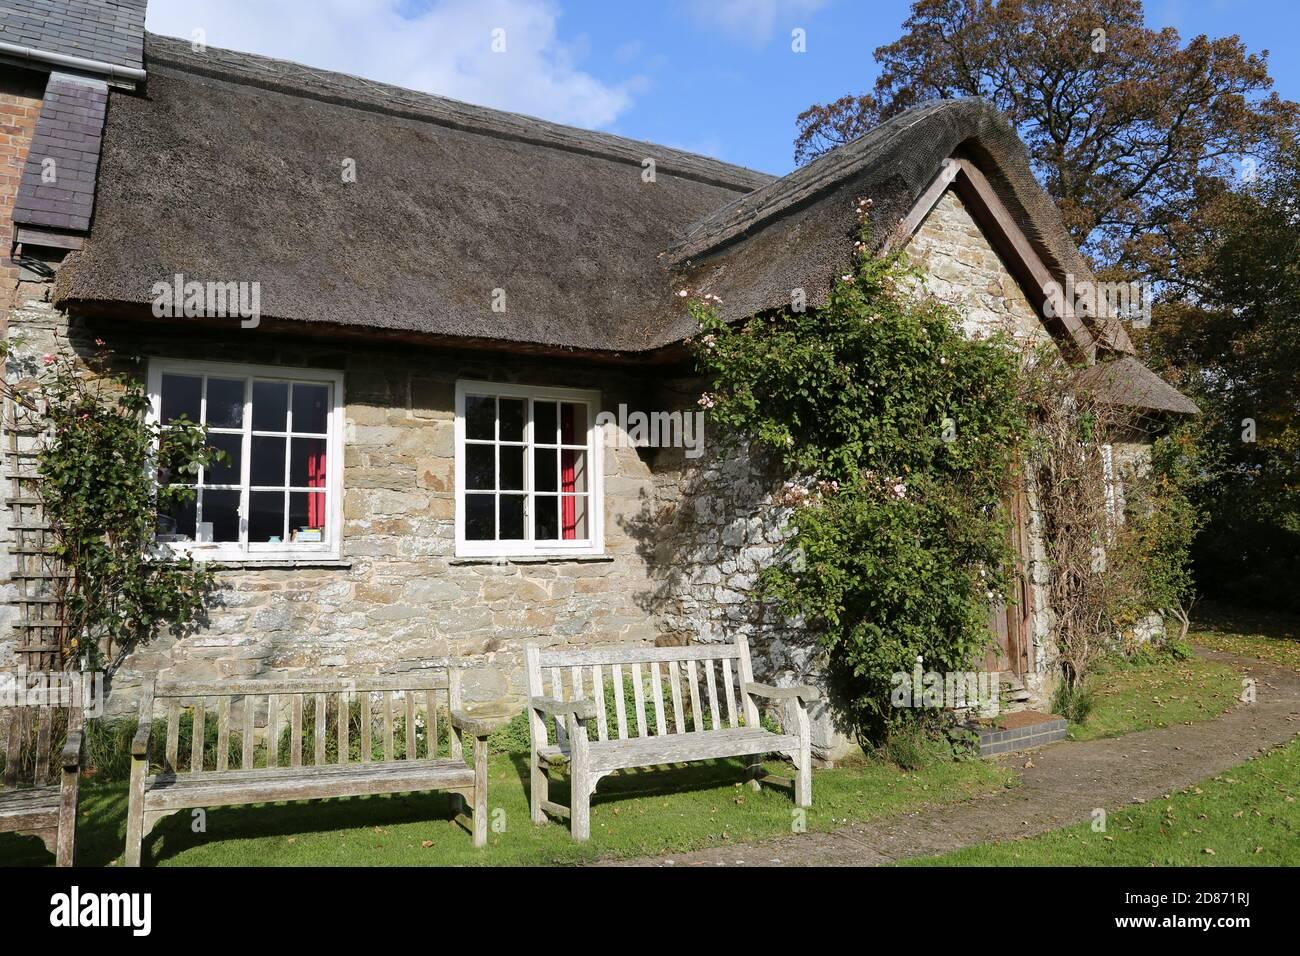 Pales Quaker Meeting House, Llandegley, Llandrindod Wells, Radnorshire, Powys, Wales, Great Britain, United Kingdom, UK, Europe Stock Photo